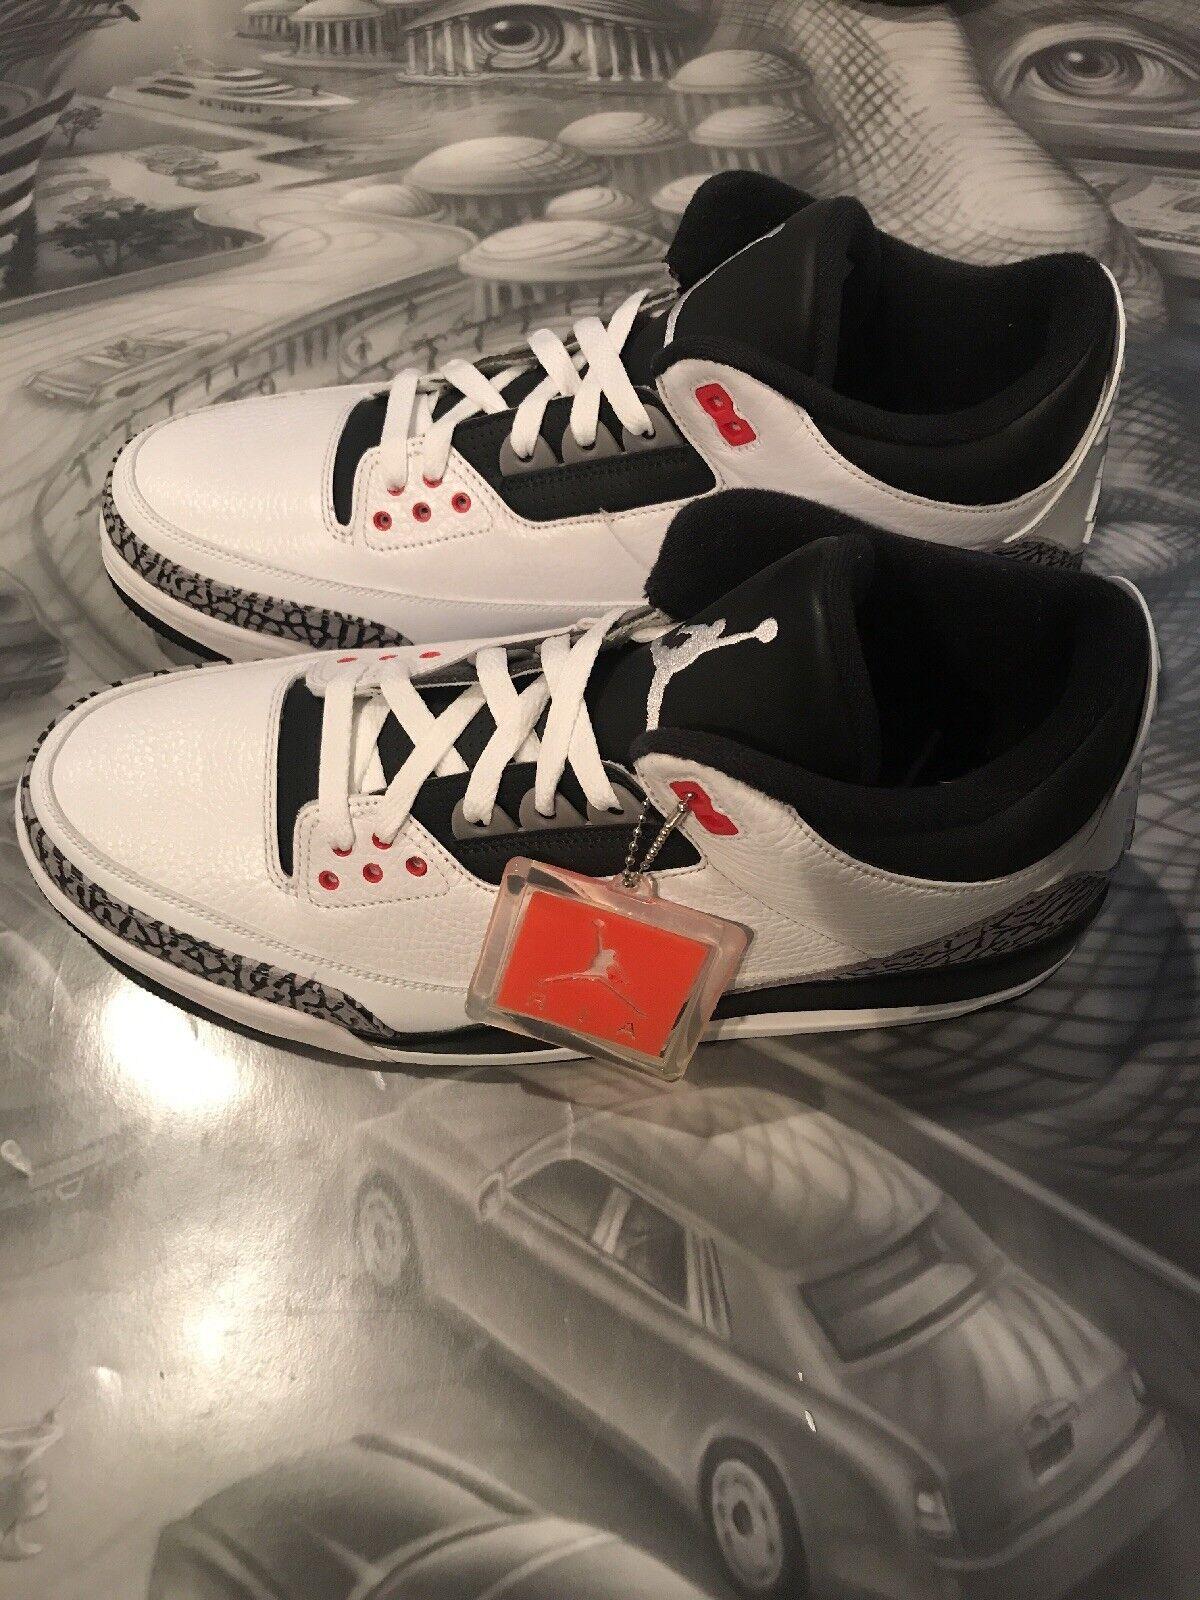 sports shoes 3f7dd b78a1 ... clearance nike air jordan 3 iii og retro classic blanco gran cemento  negro sz 13 gran ...